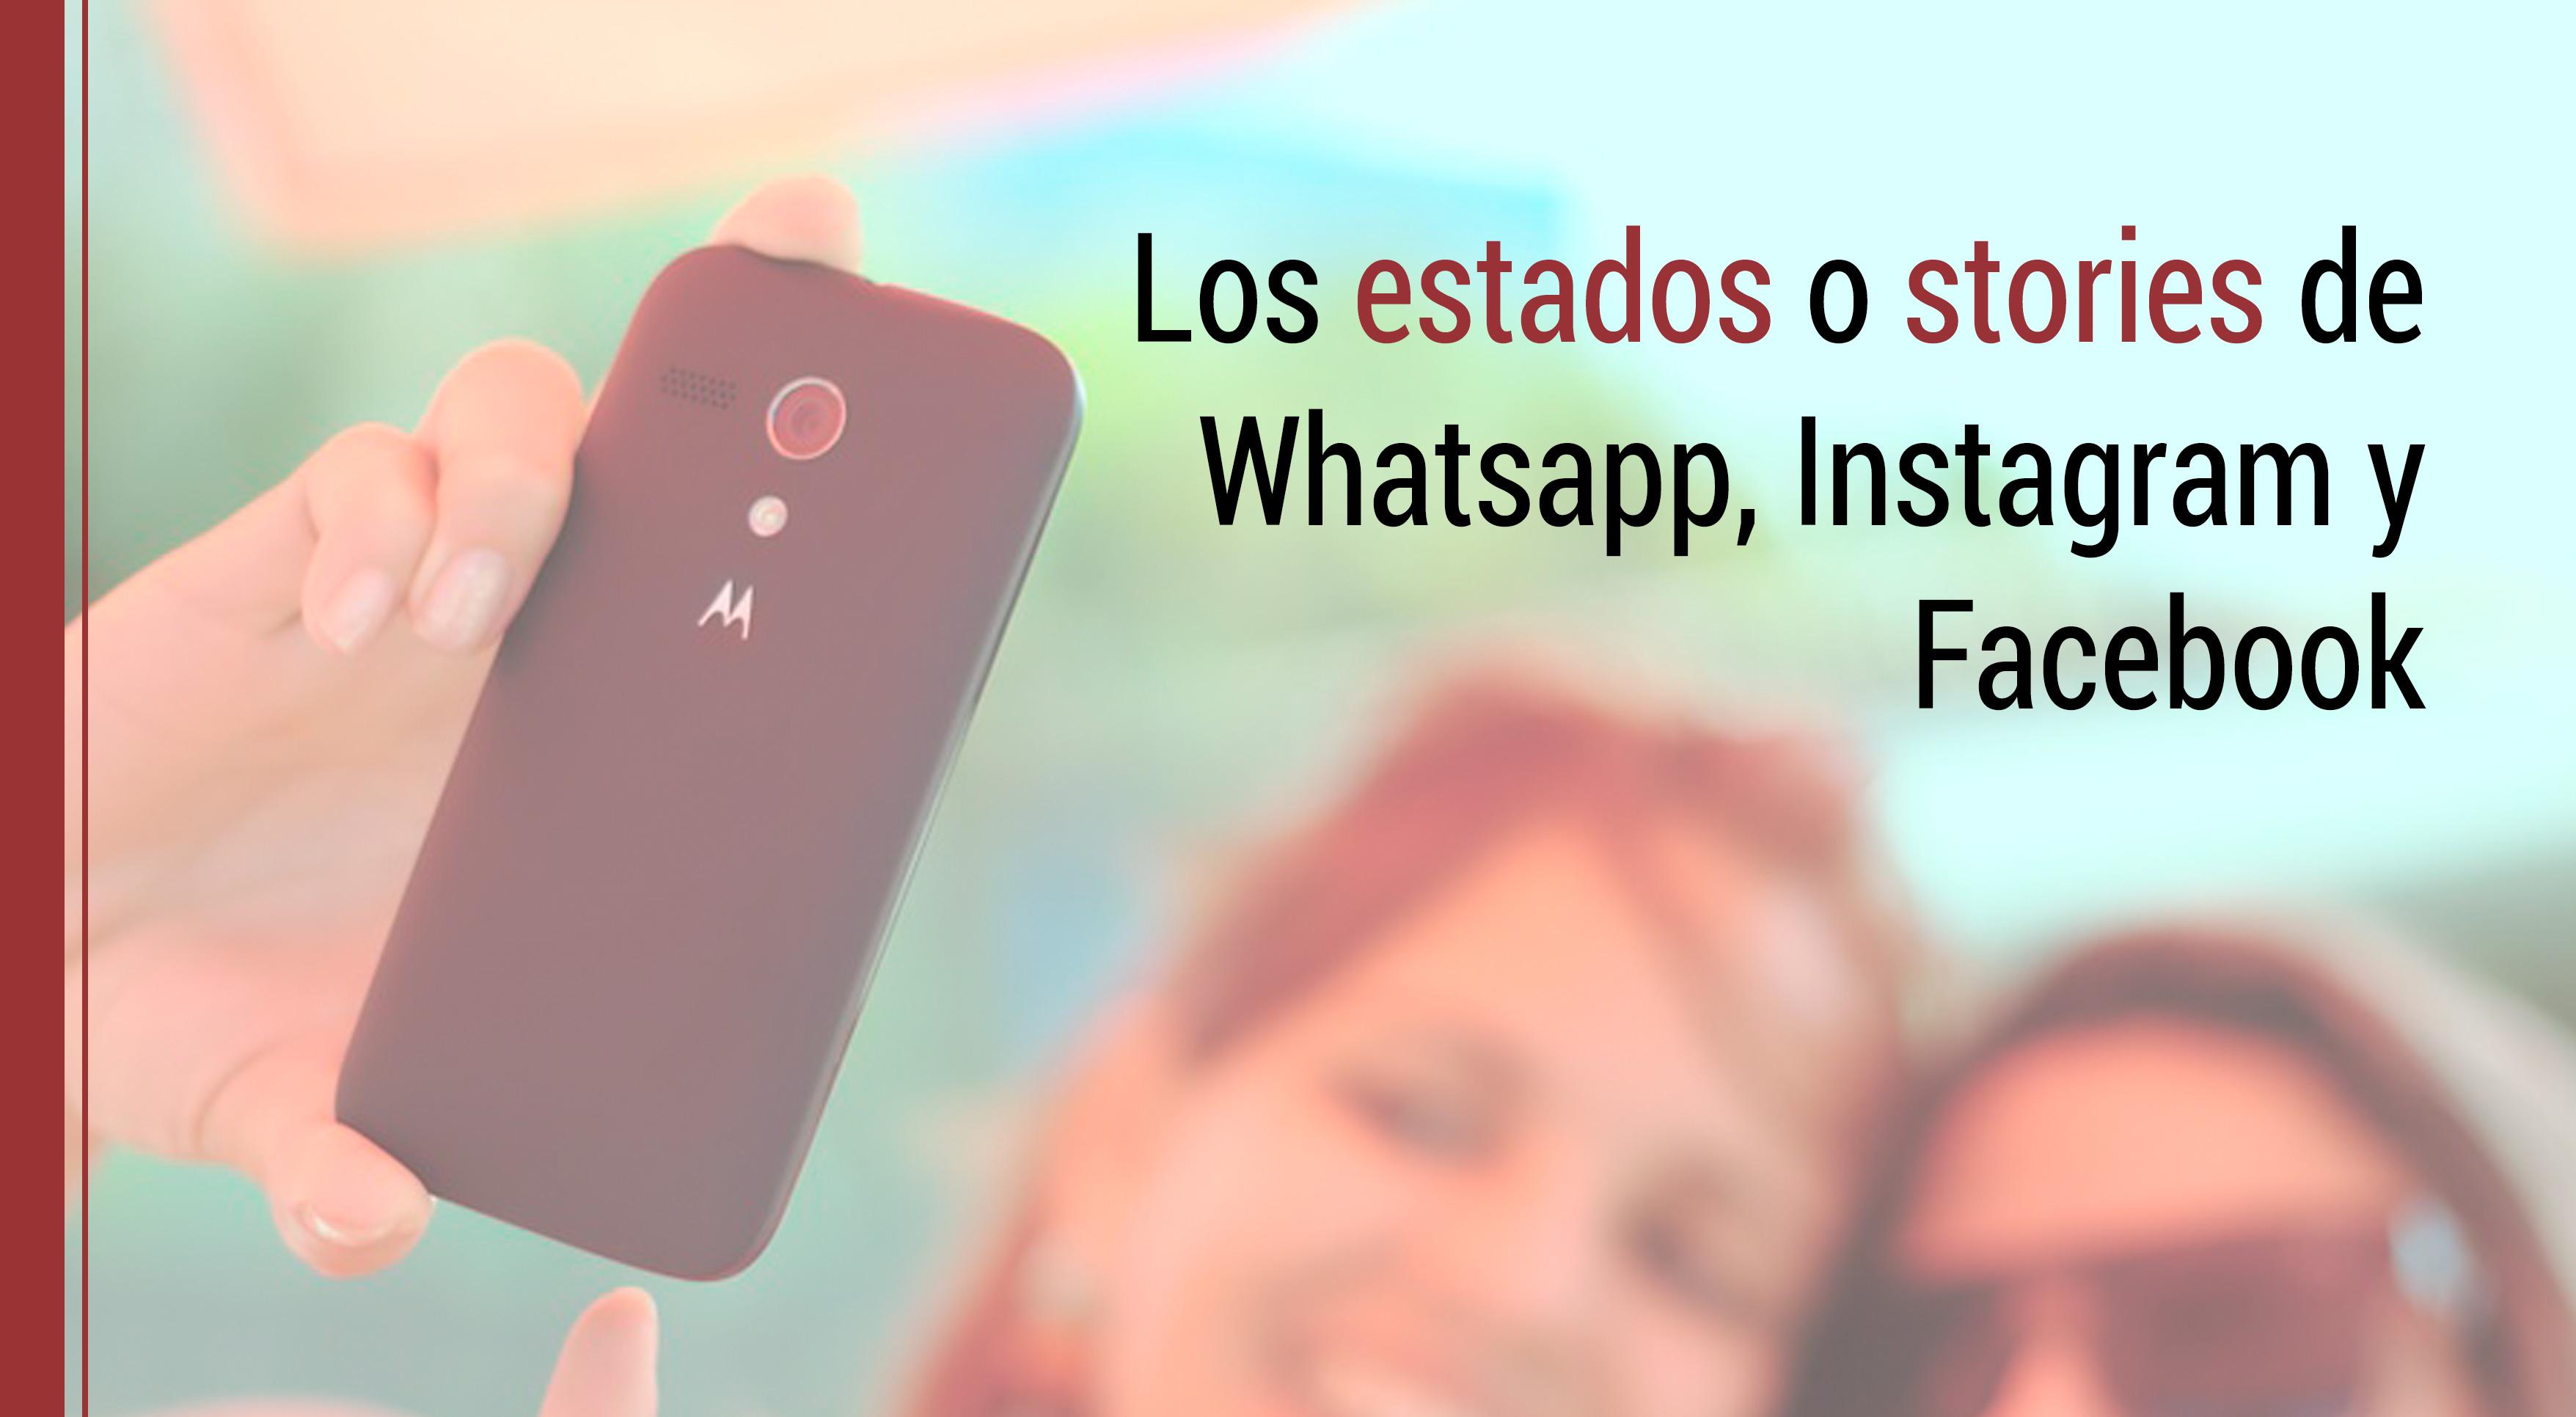 peligros-estados-whatsapp-instagram-facebook Los peligros de los Estados de Whatsapp, Instagram y Facebook